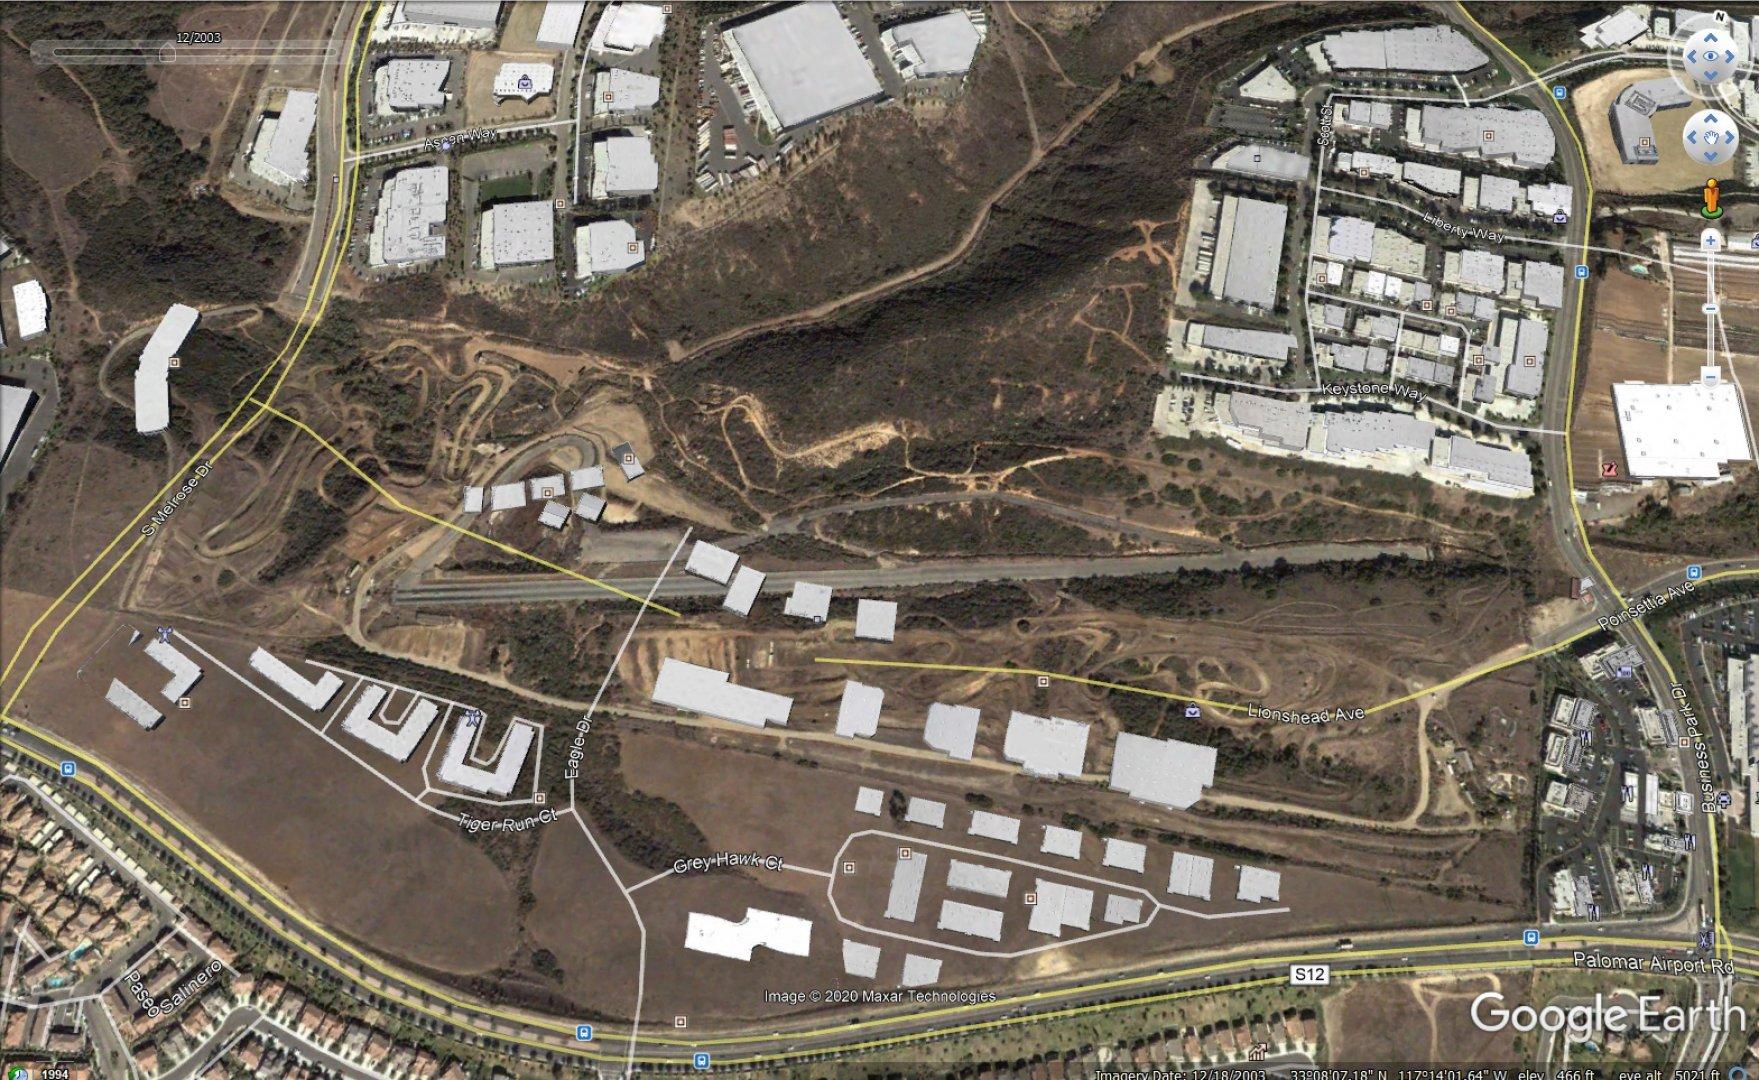 Carlsbad Raceway Google Earth with buildings 12-2003.JPG